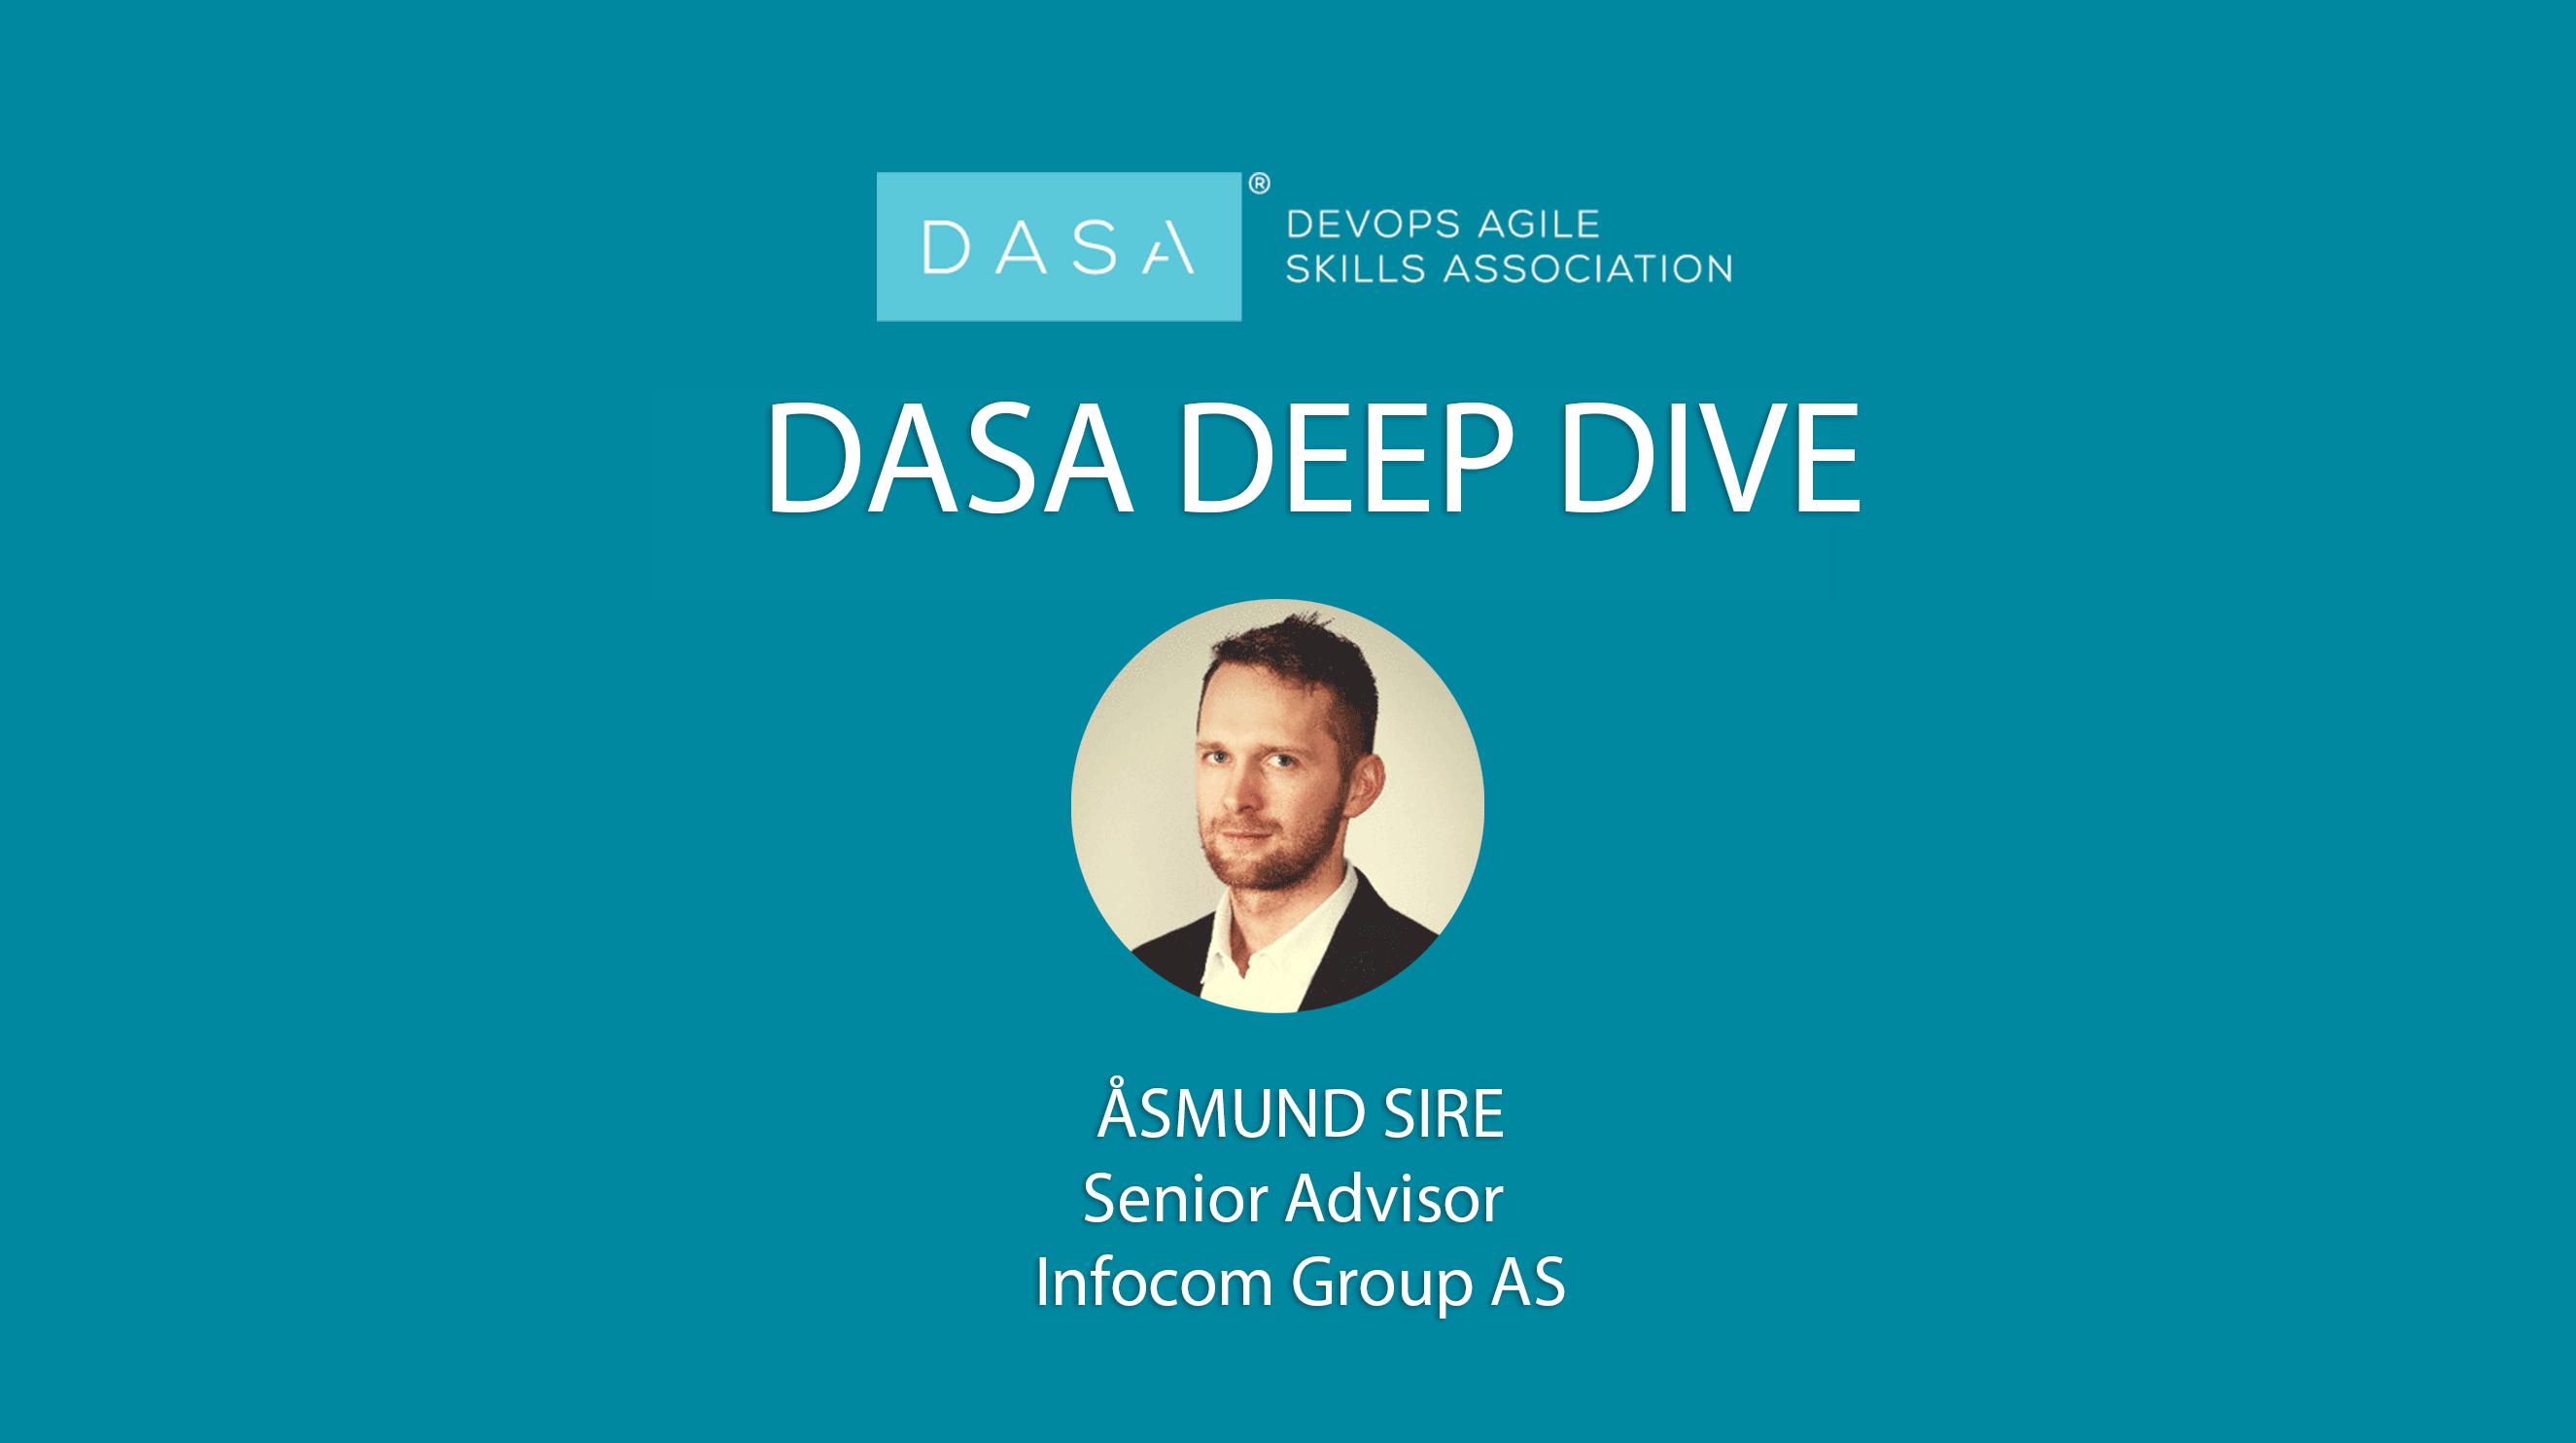 DASA-Deep-Dive-asmund